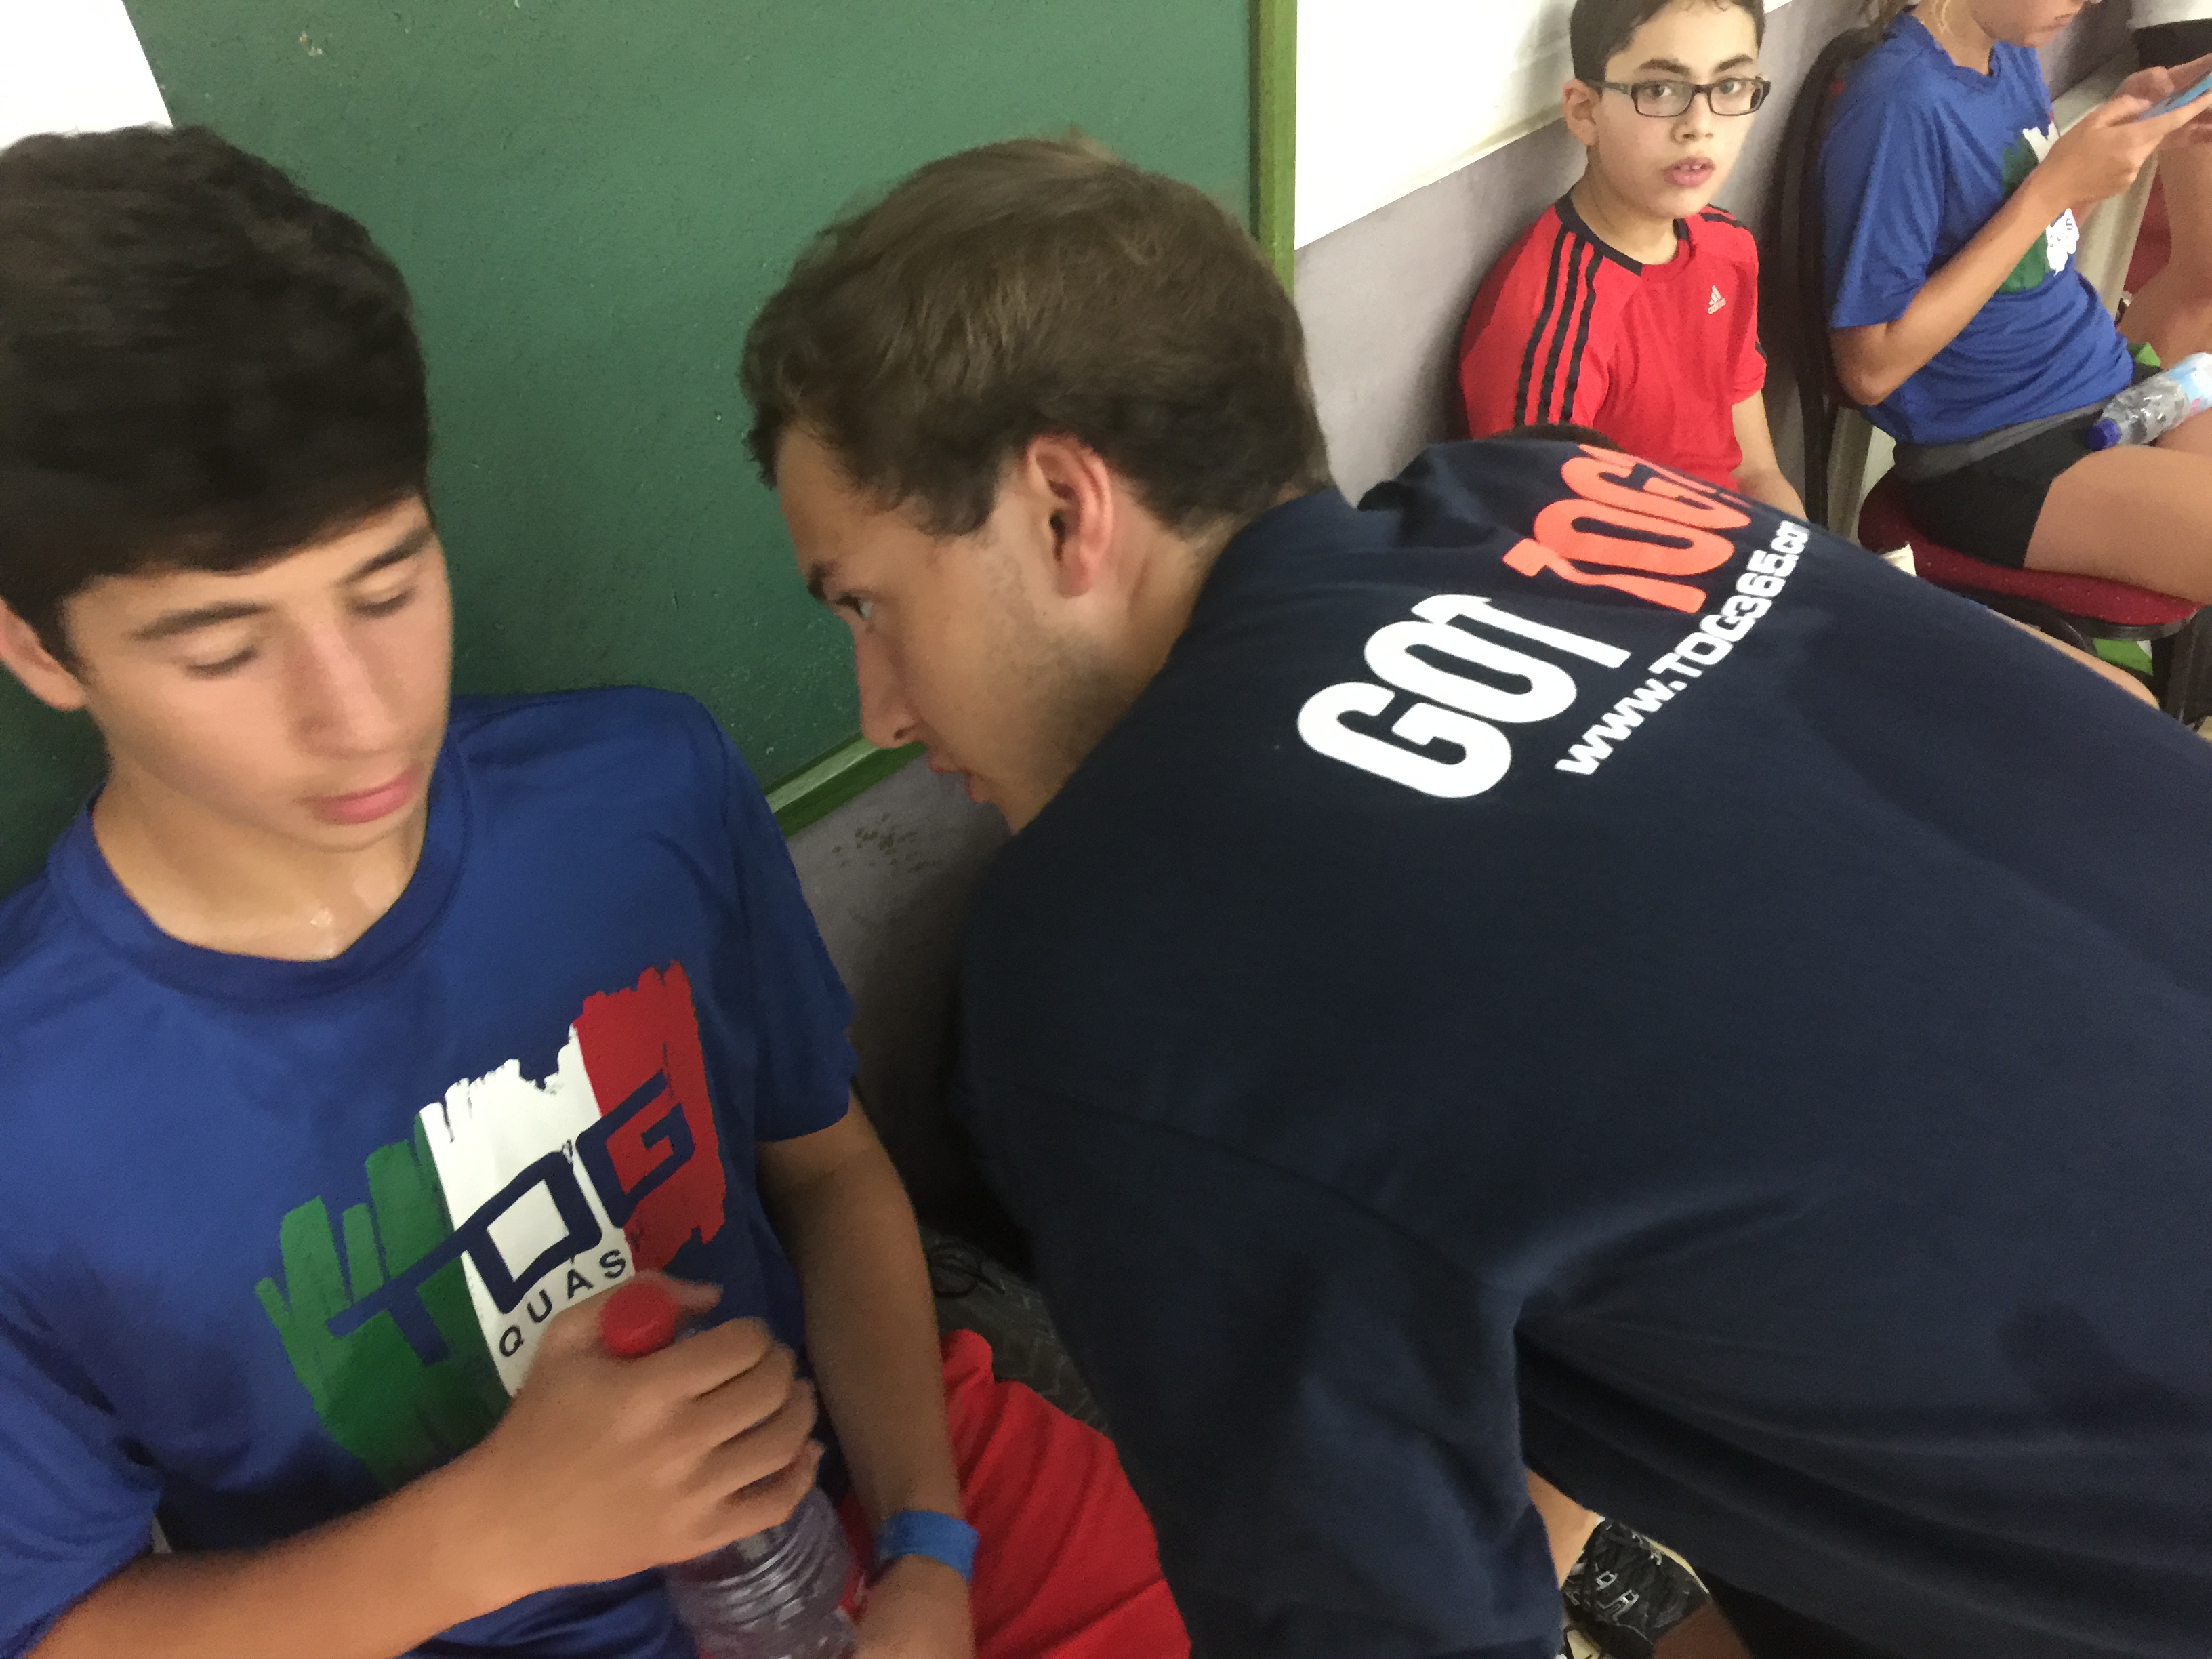 TOG Squash Camp Europe 2015